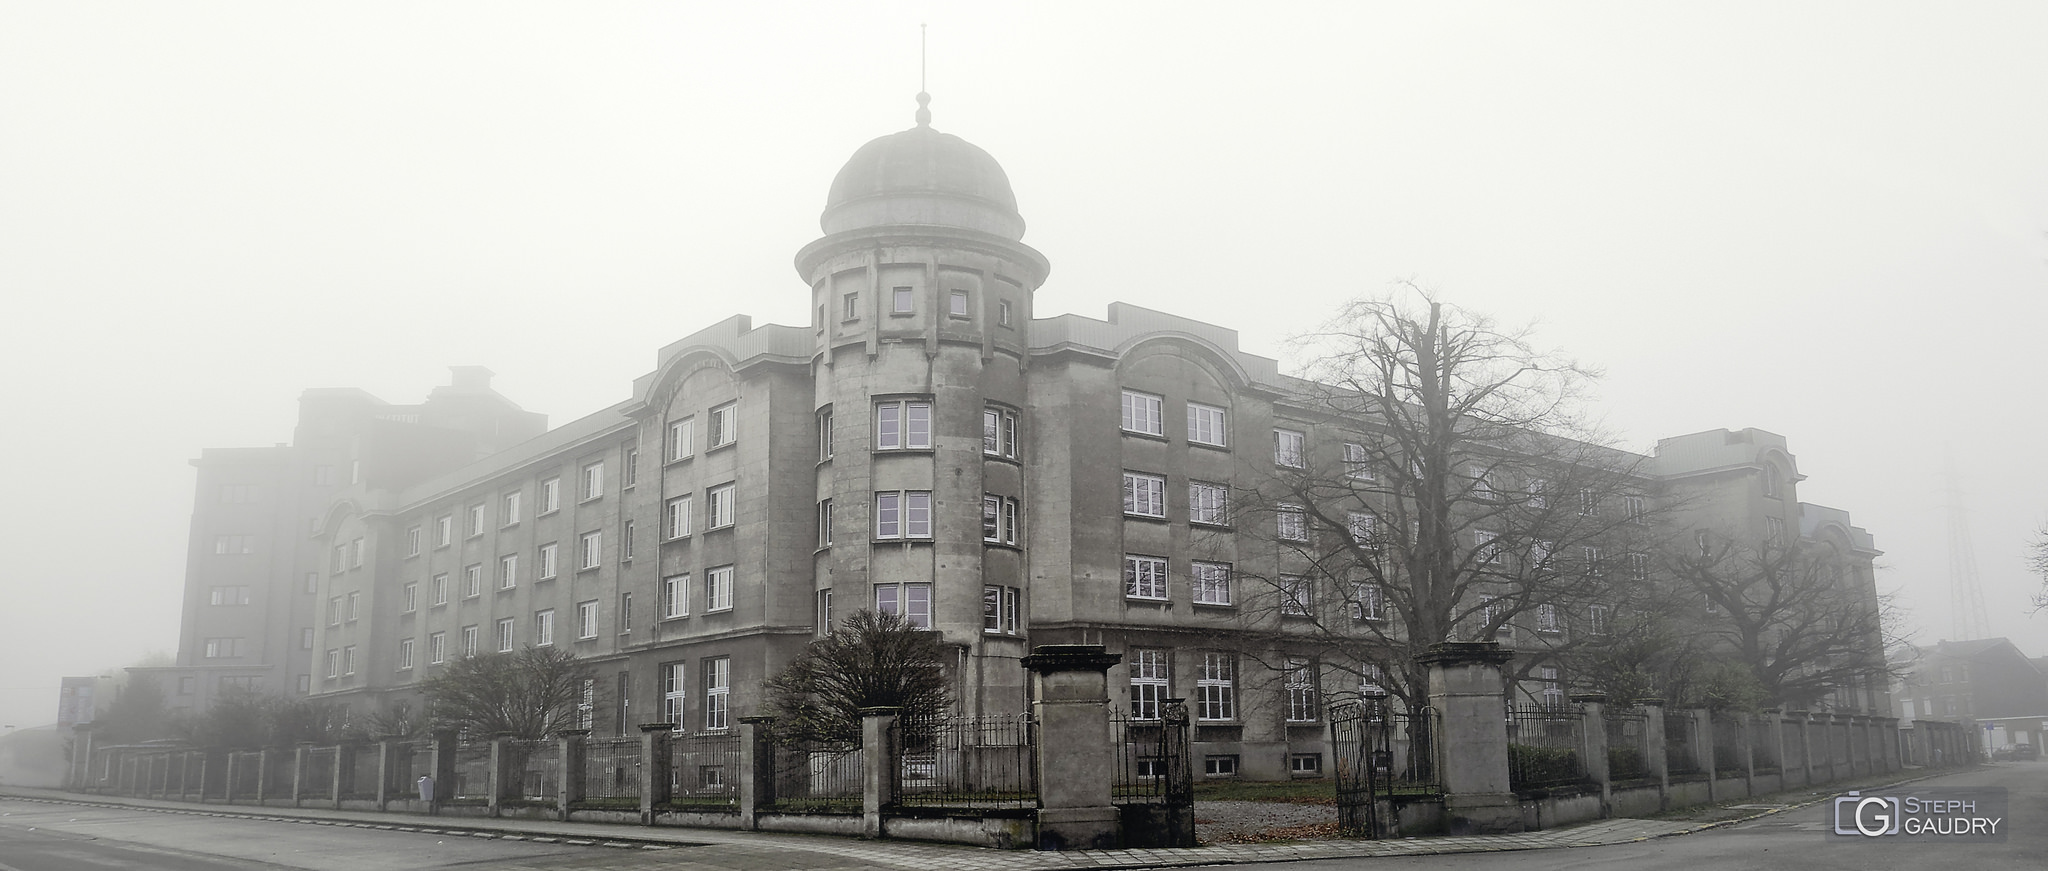 Brouillard ce matin sur Liège...